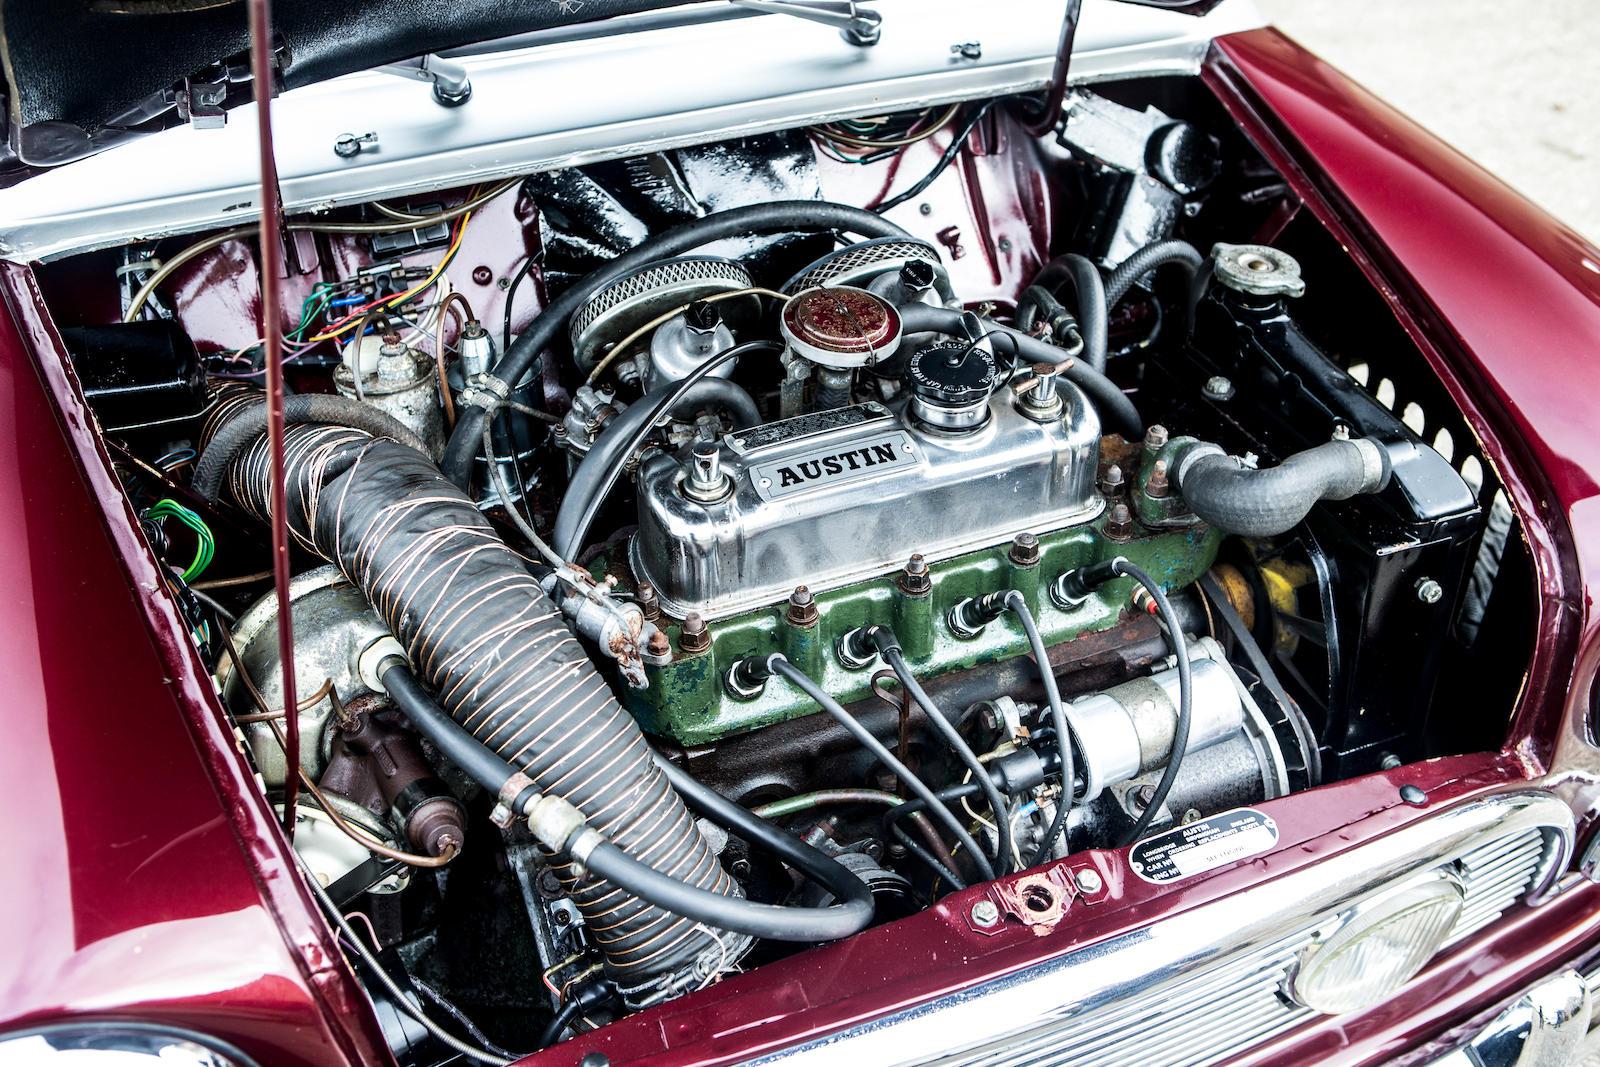 1966 Austin Mini Cooper S engine